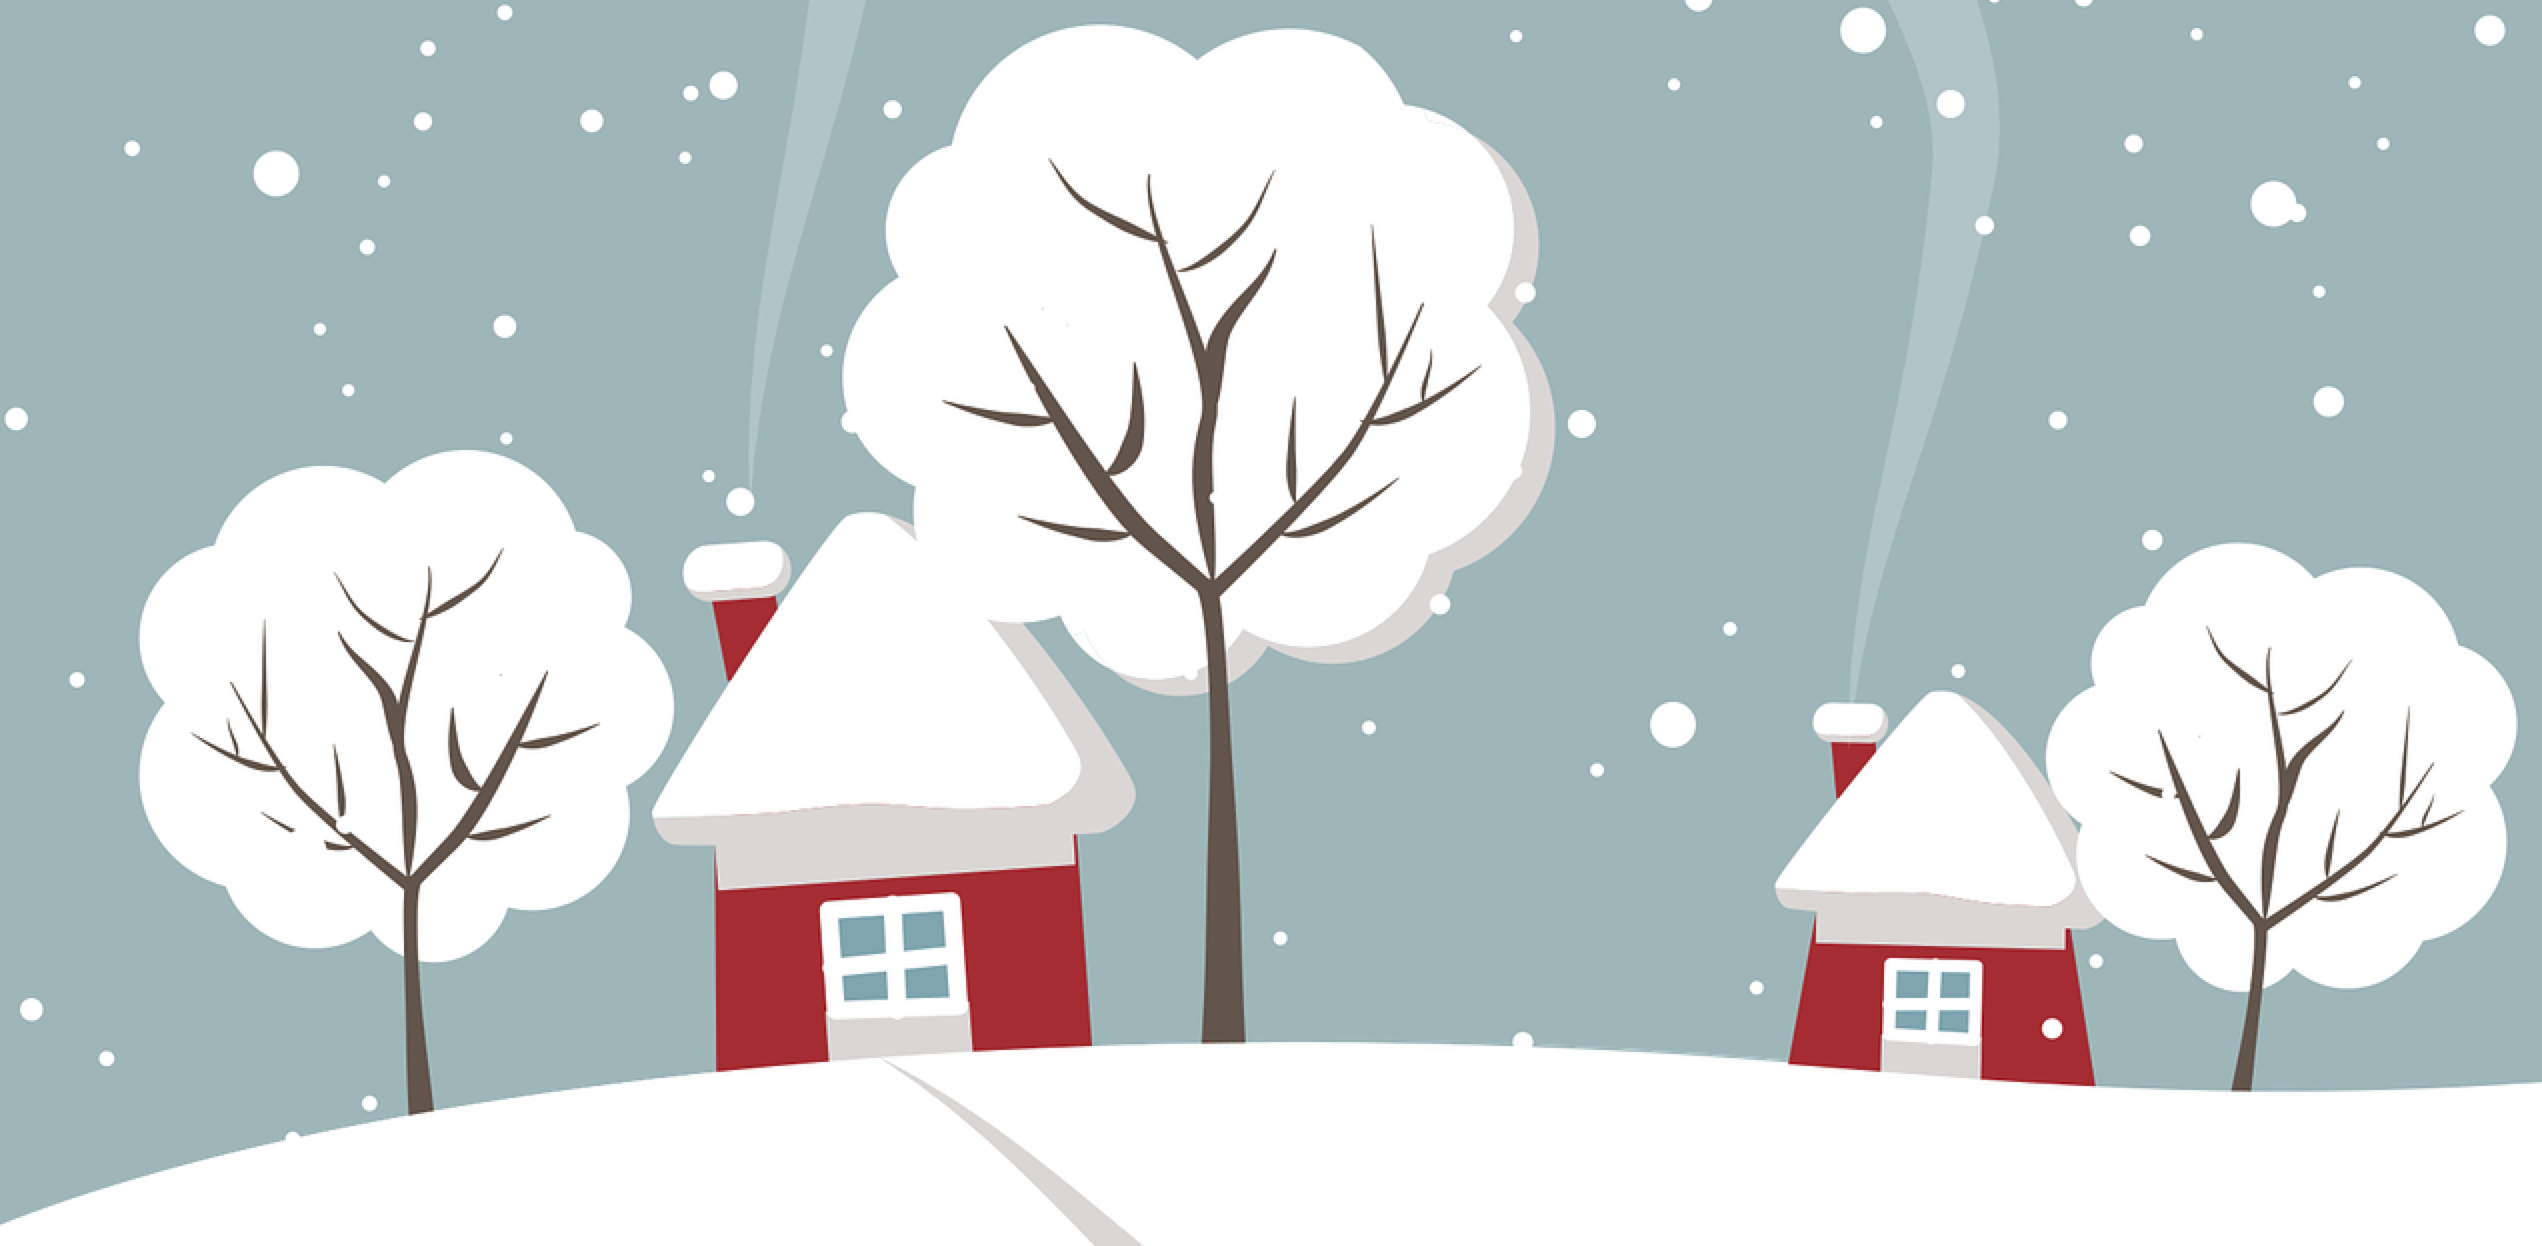 Rental Property Management Winter Maintenance